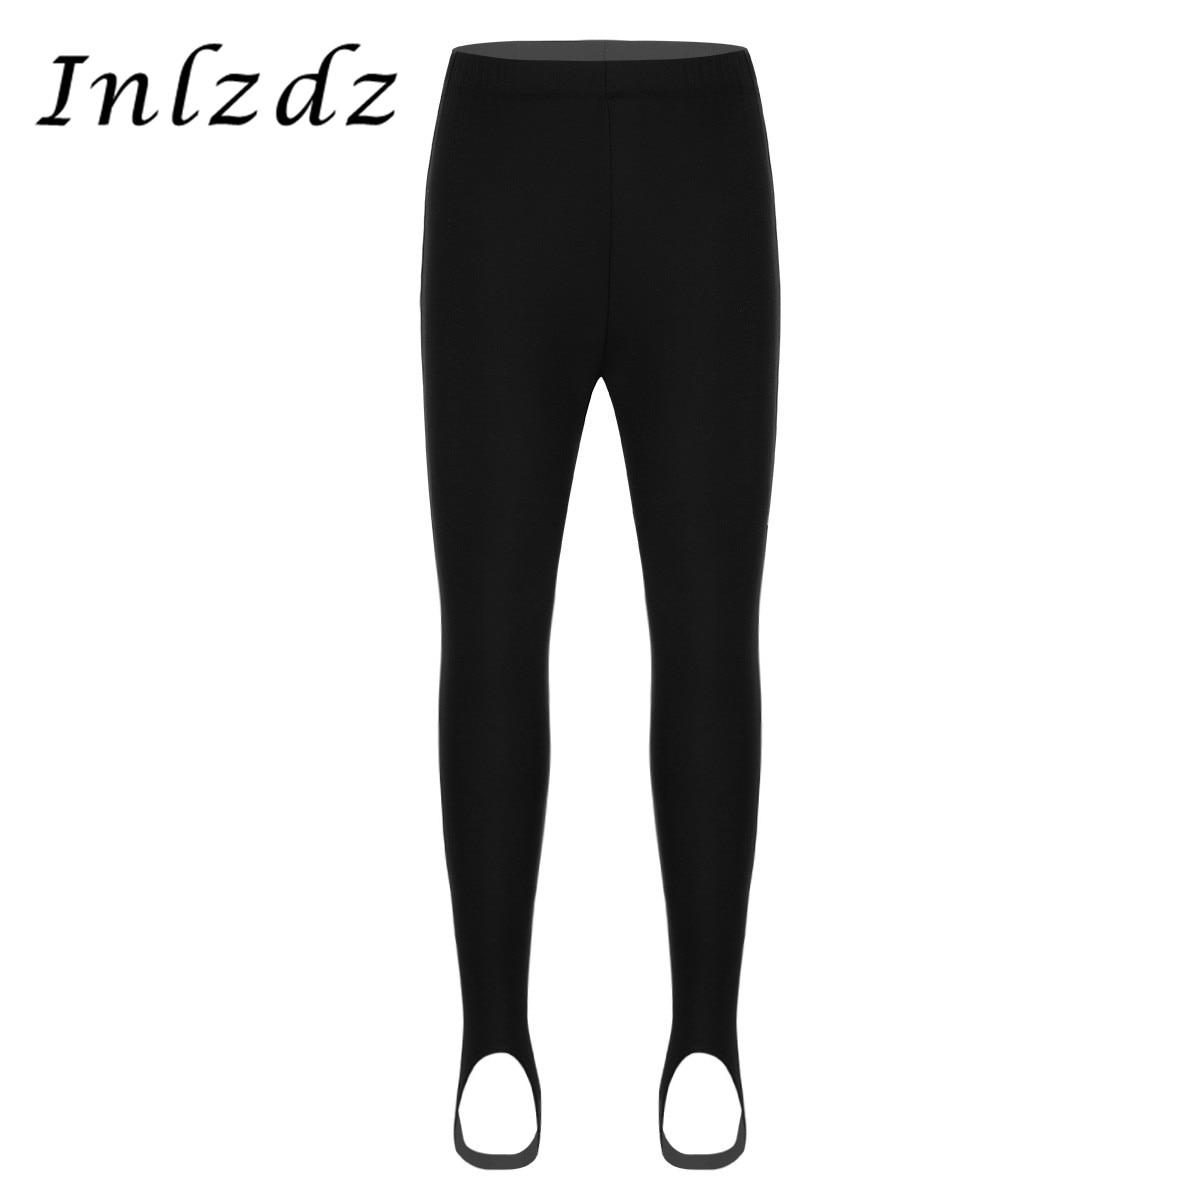 Kids Boys Girls Ballet Dance Pants Costume Gymnastics Leotard Ballet Yoga Pants Stirrup Pantyhose Stockings Tights Leggings